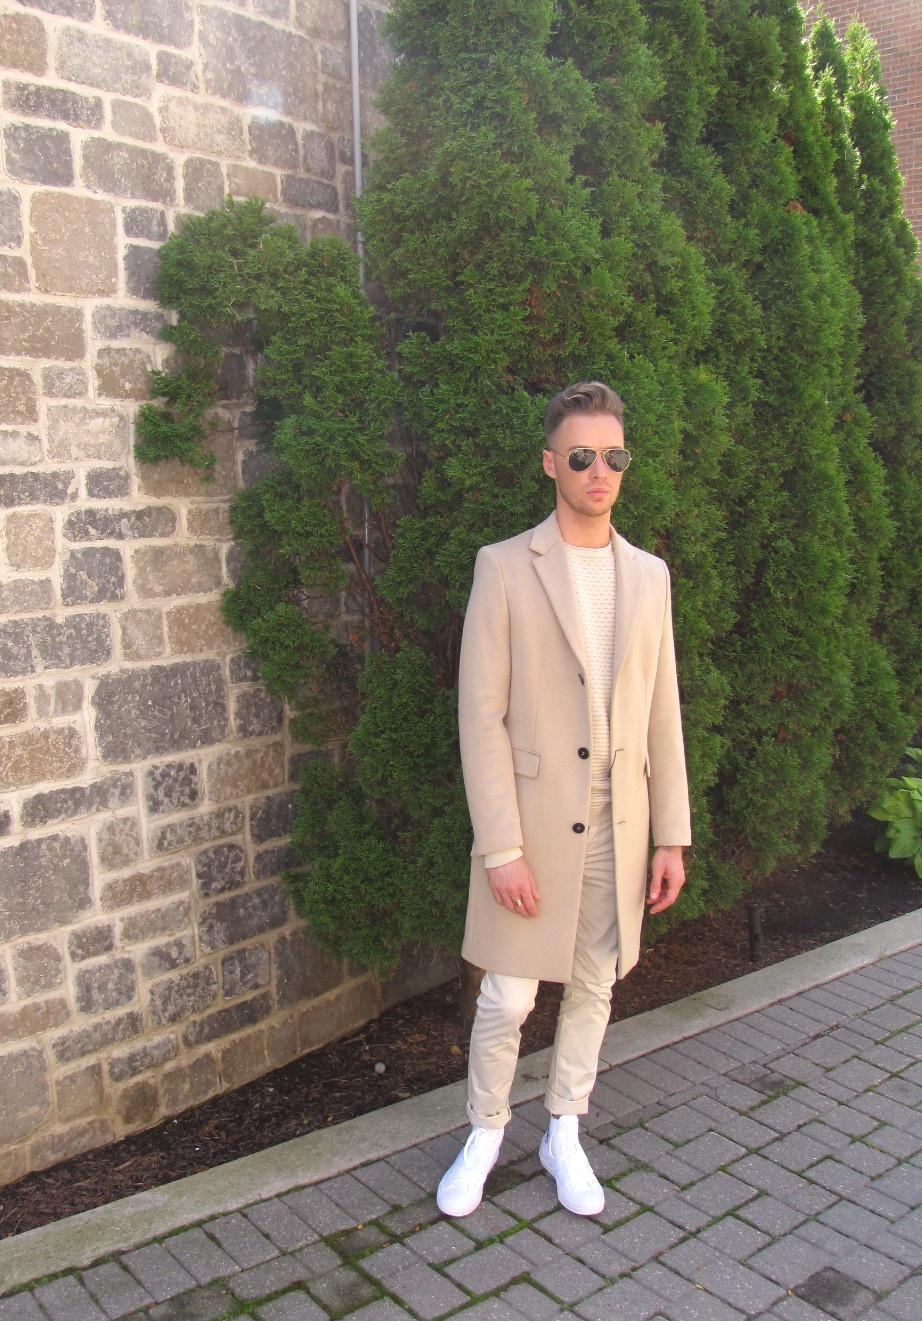 Noie Fashion The Men's Monochromatic Look